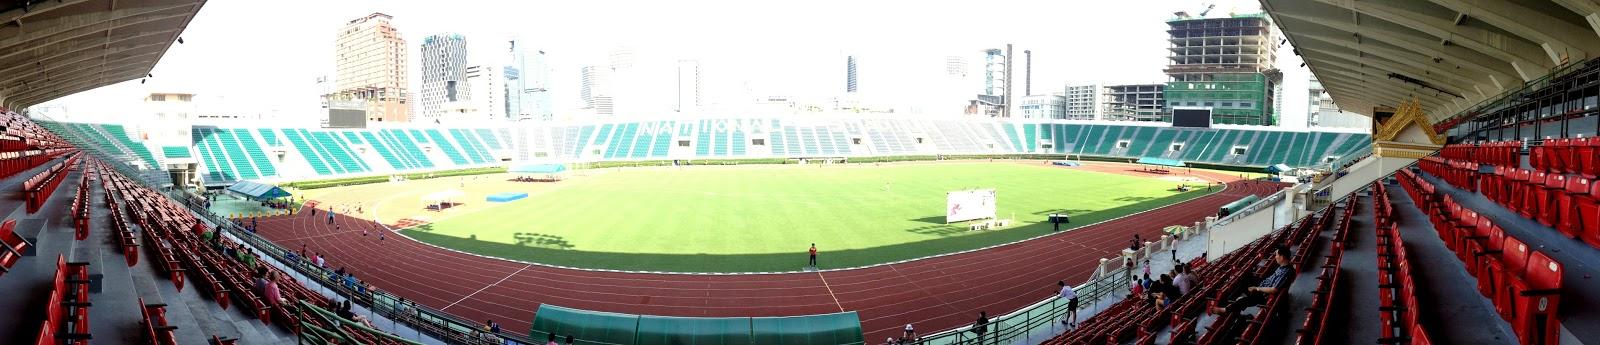 Hopping All Over The World Suphachalasai National Stadium Bangkok